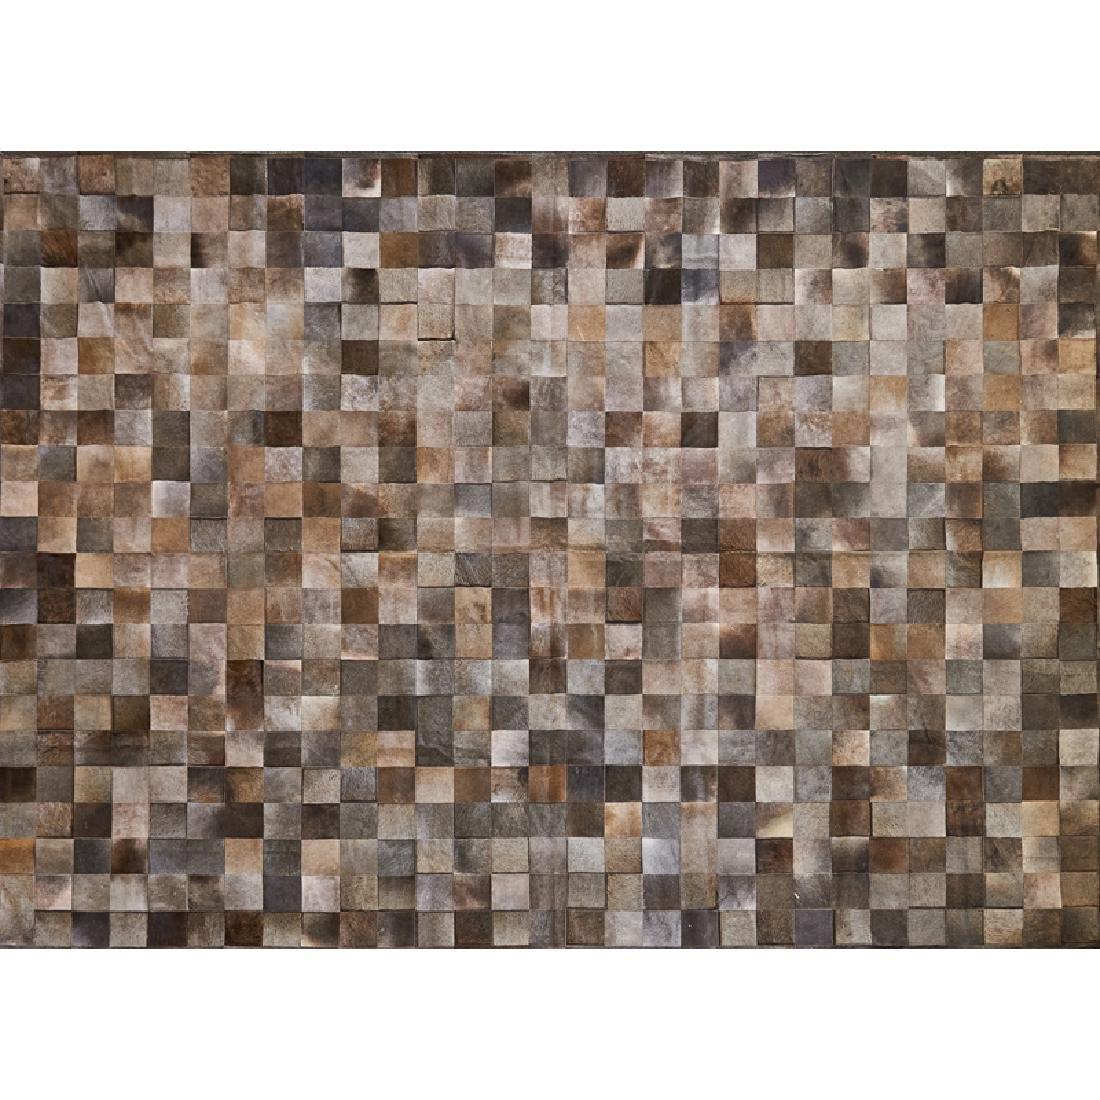 MARC PHILLIPS Massive cowhide rug